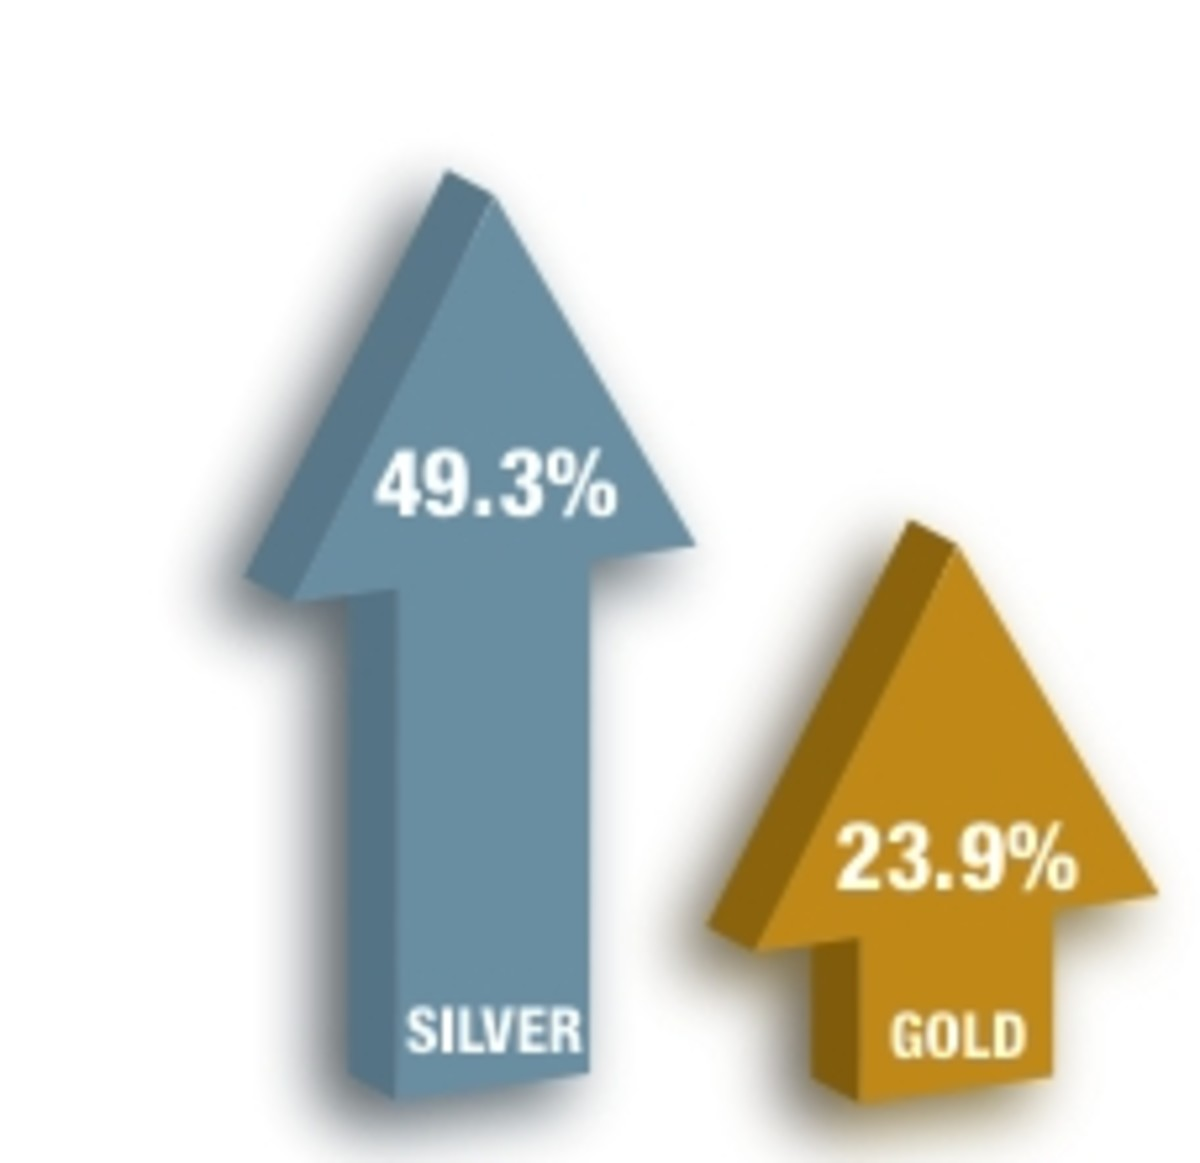 silvergoldchart.jpg